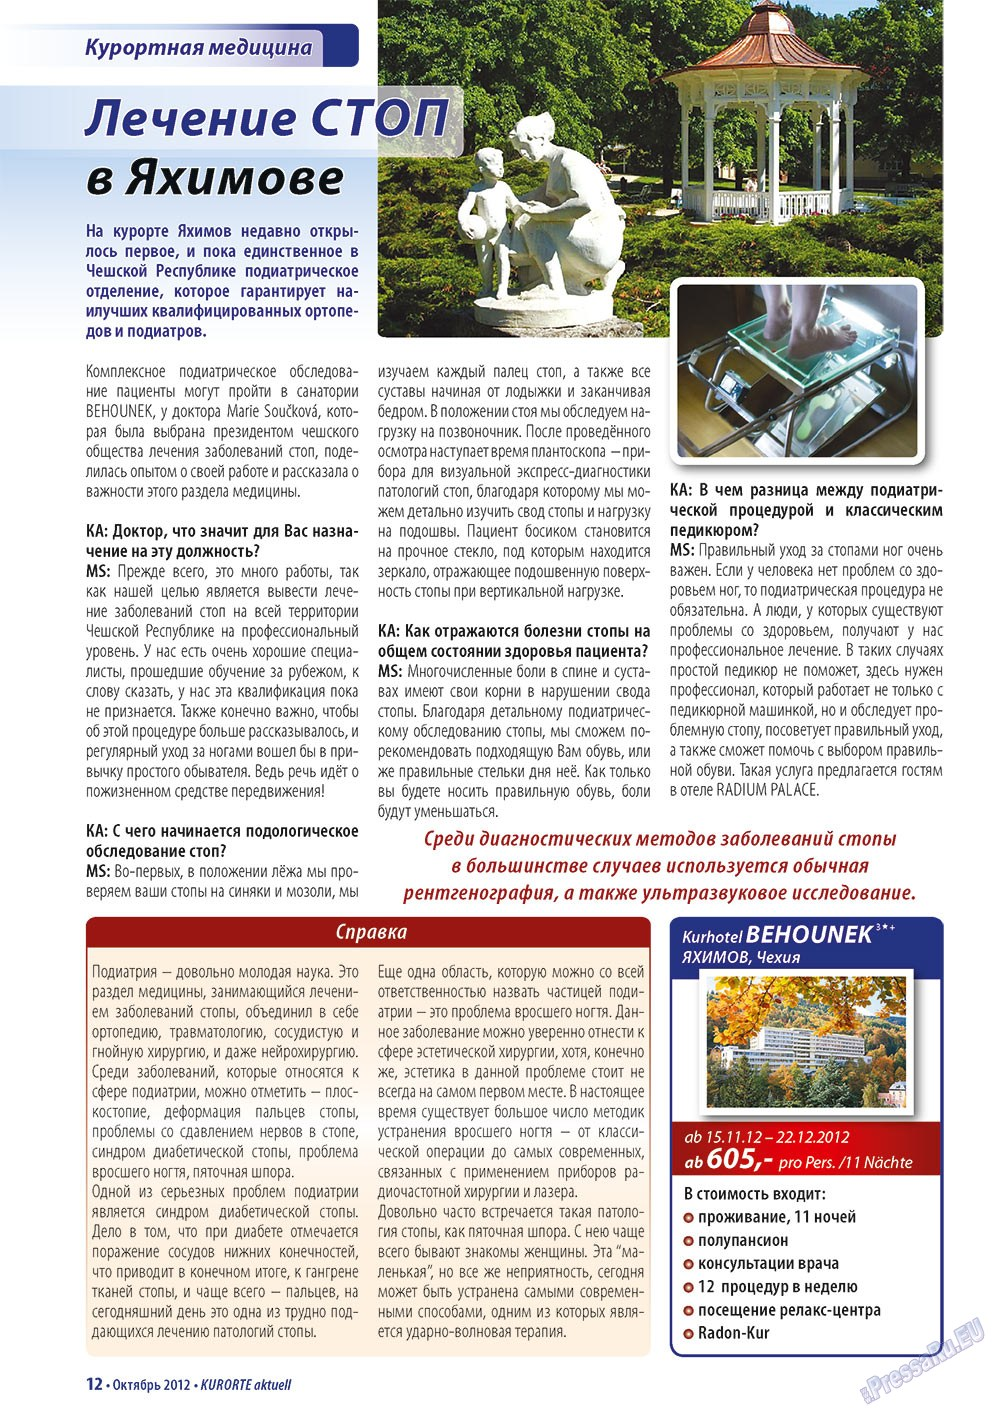 Kurorte aktuell (газета). 2012 год, номер 26, стр. 12